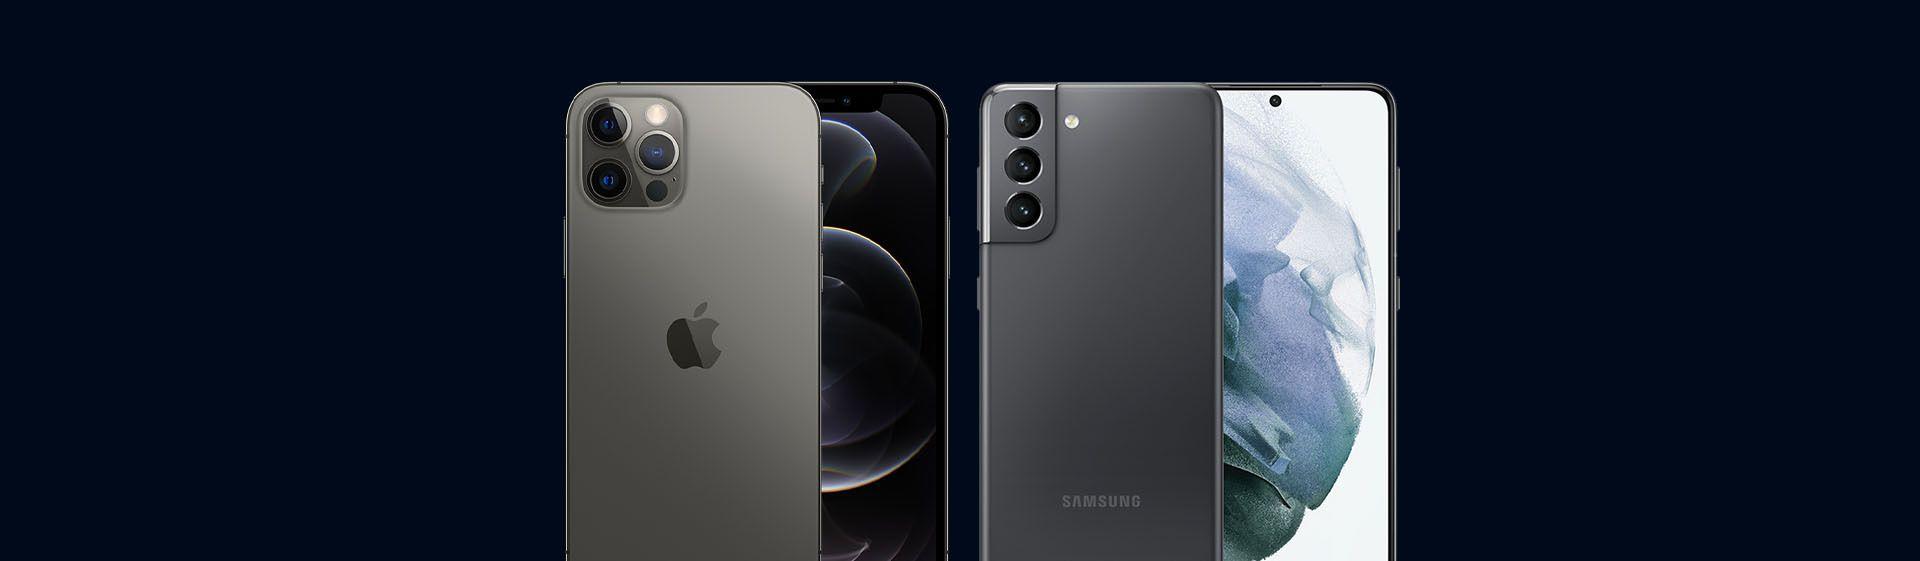 iPhone 12 Pro vs Galaxy S21 Plus: comparativo entre os celulares Apple e Samsung